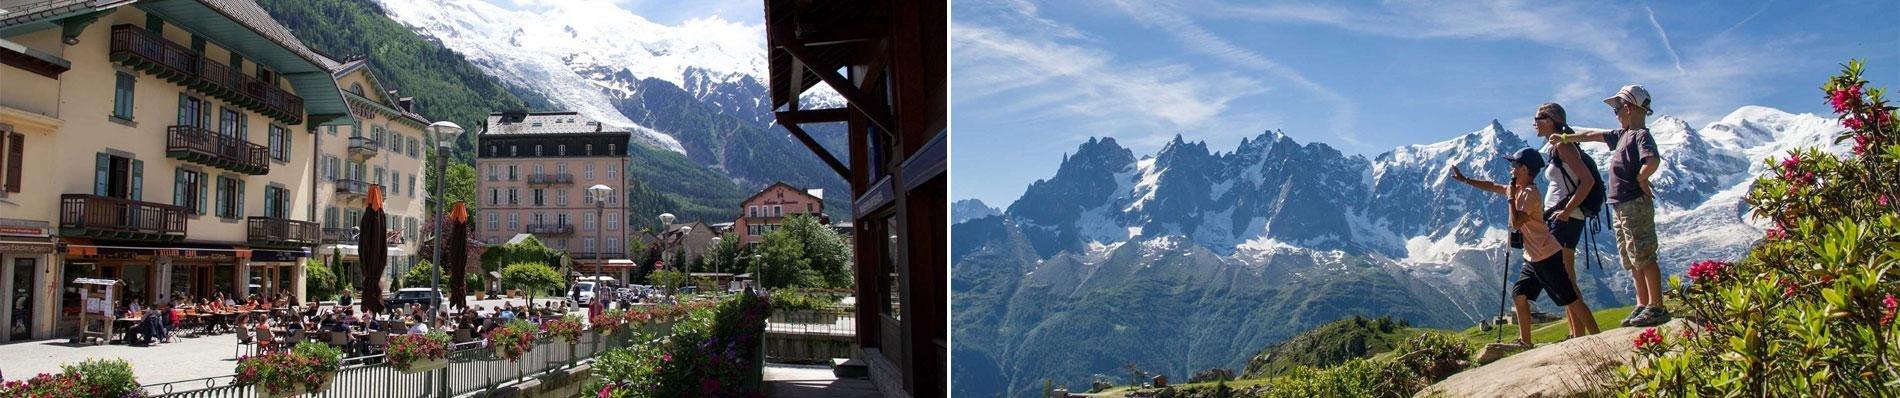 dormio vallorcine zomer alpen